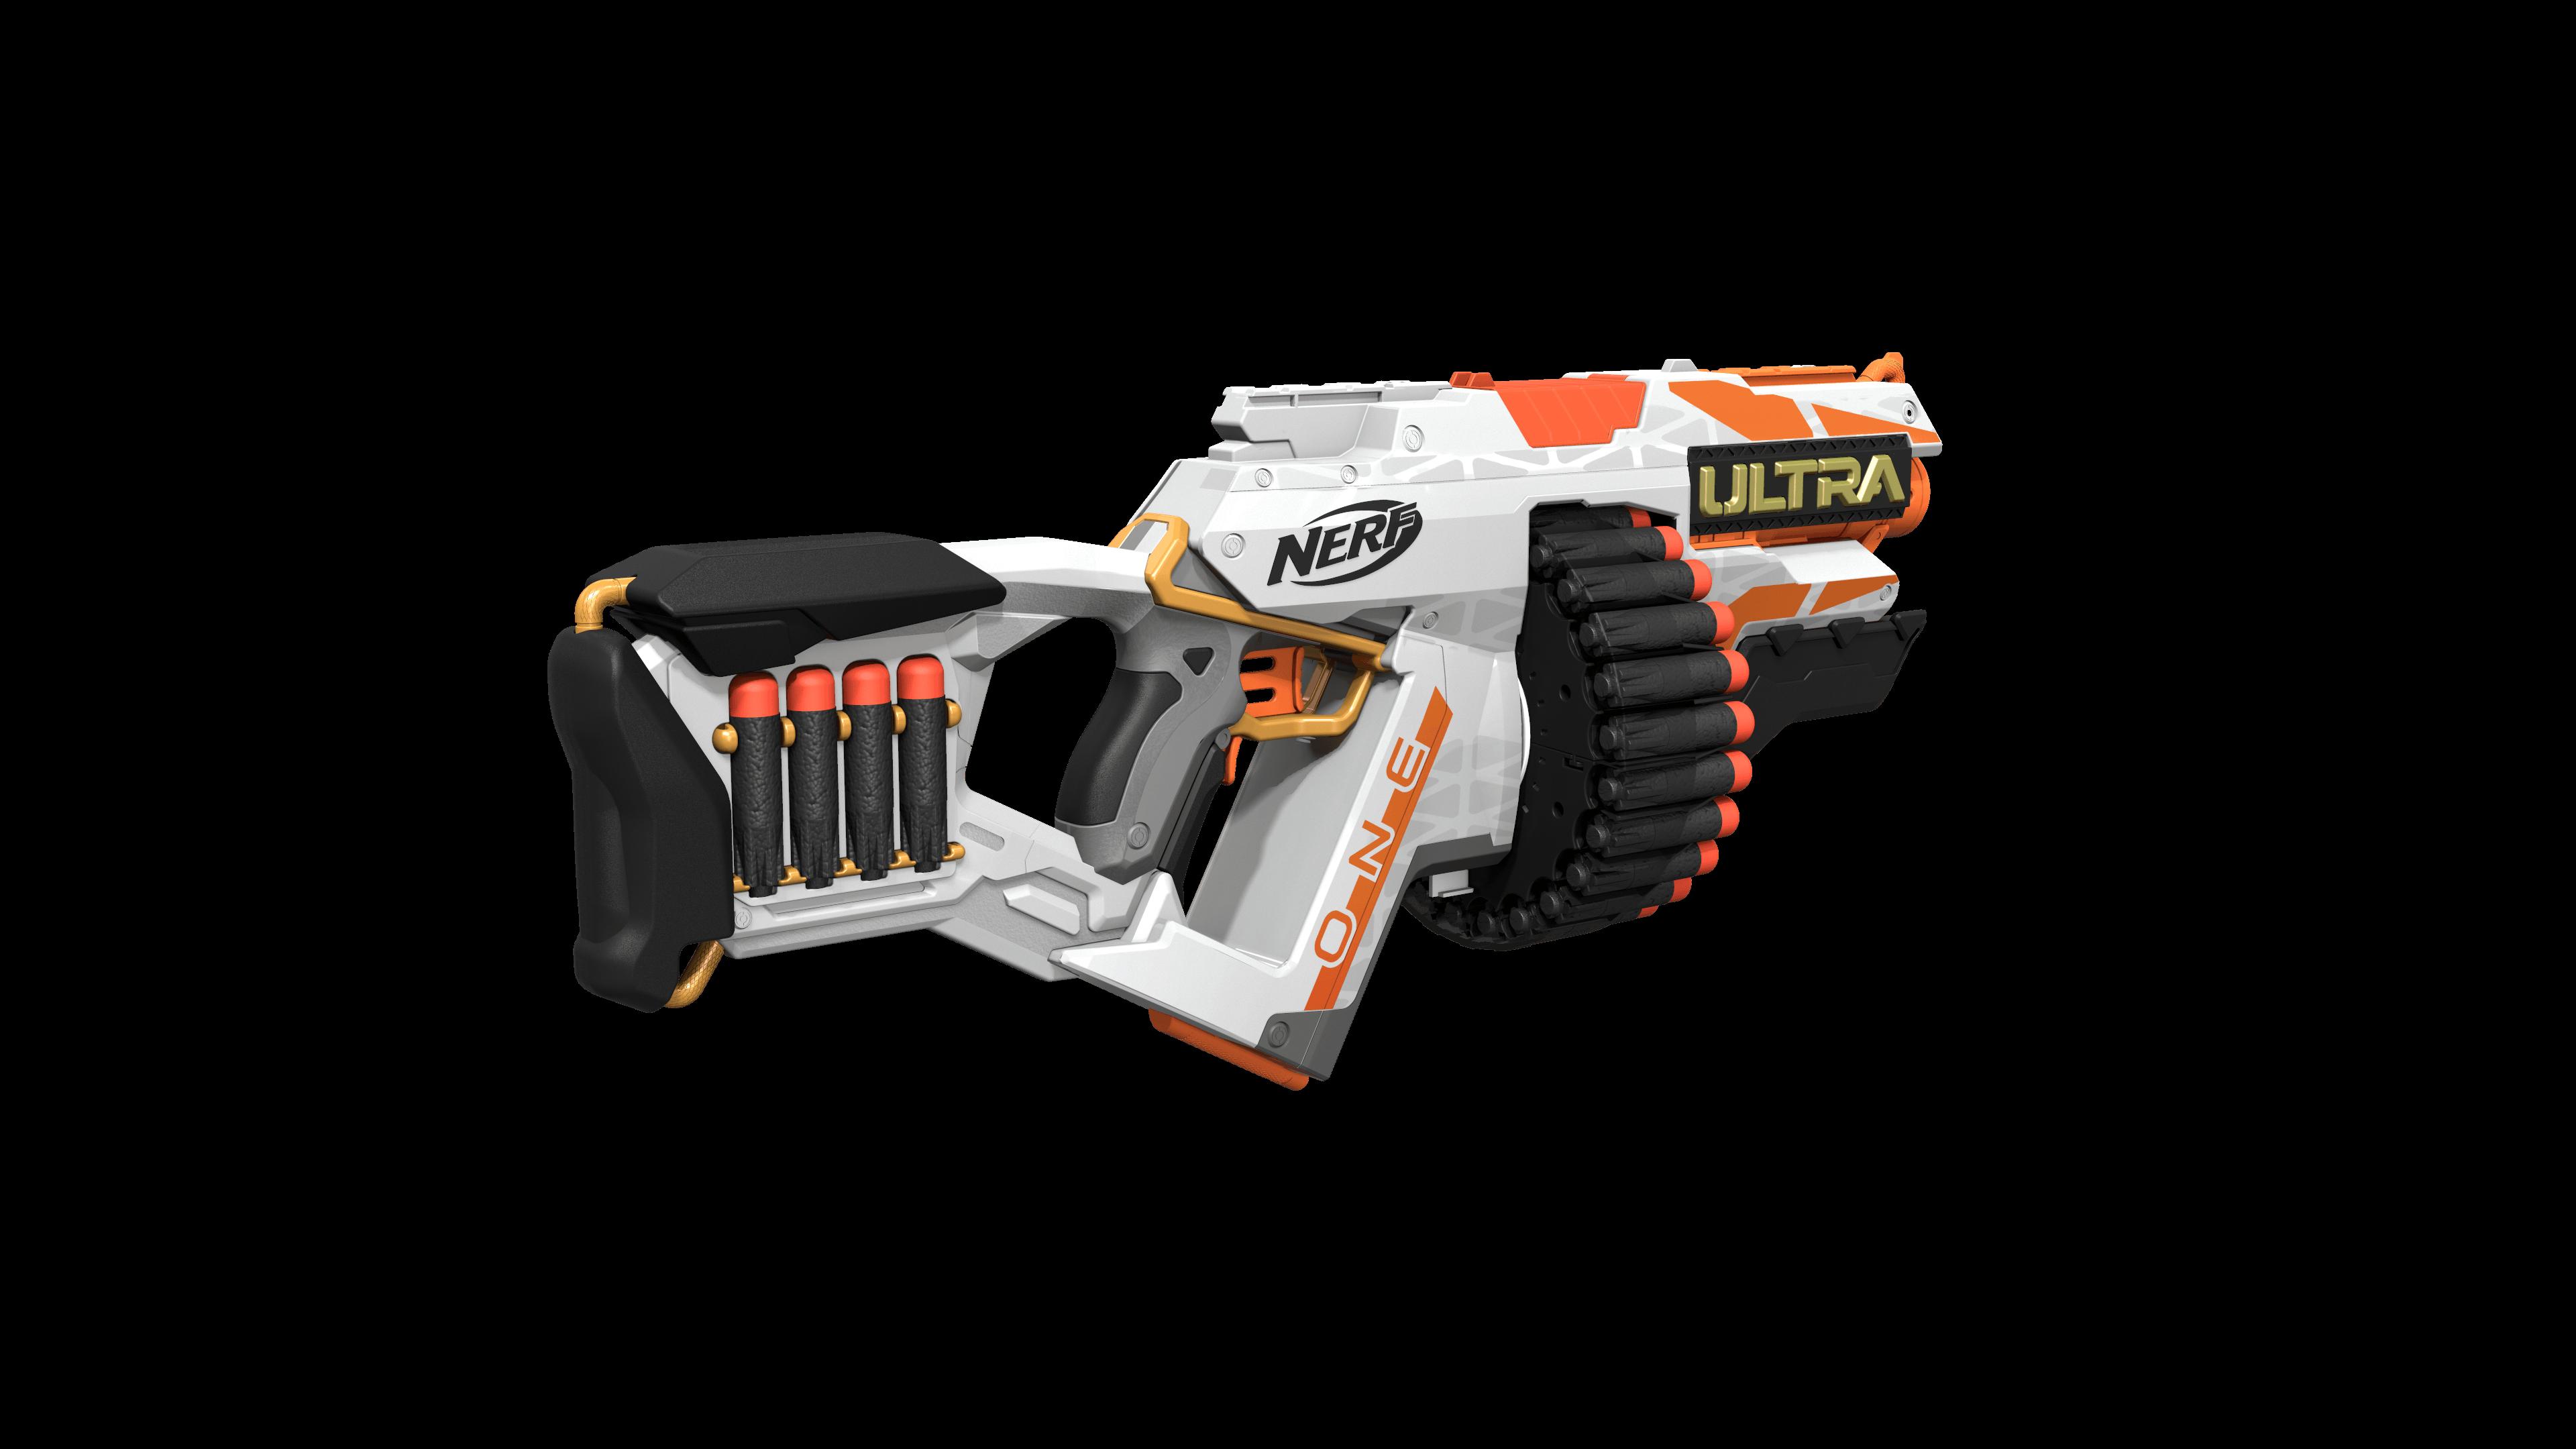 ultra blaster img 14